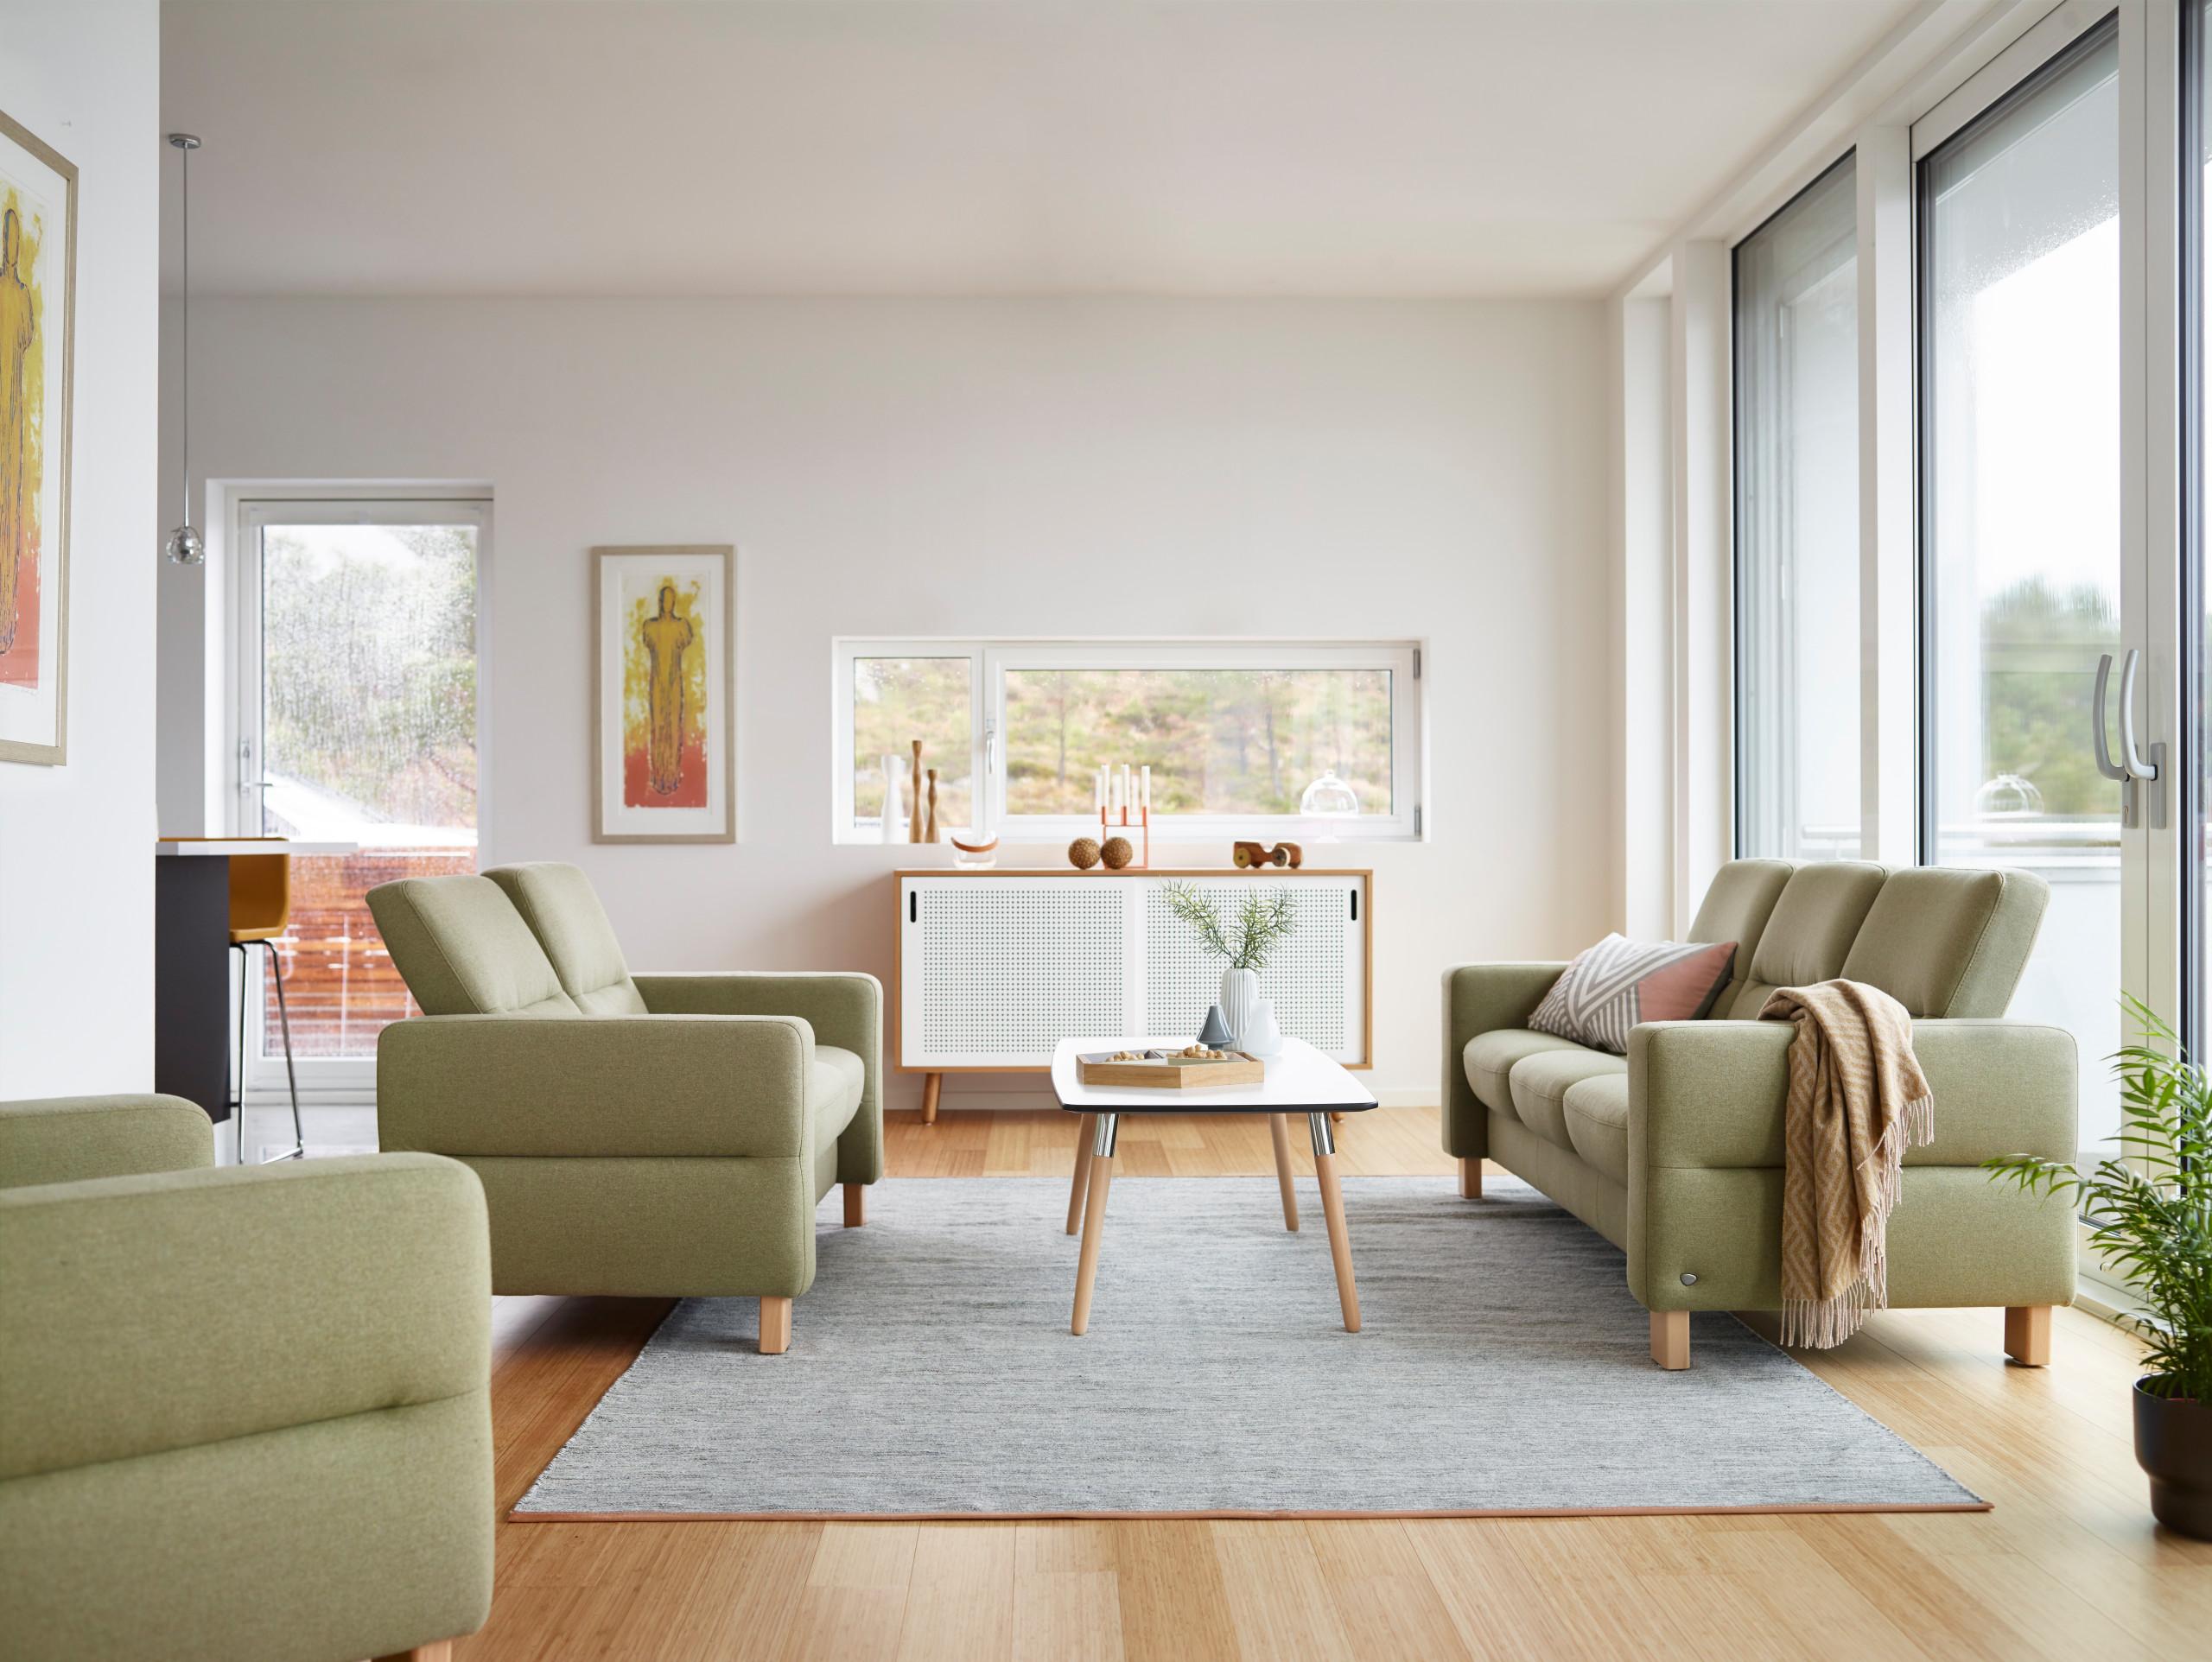 Olive Green Living Room Ideas & Photos | Houzz